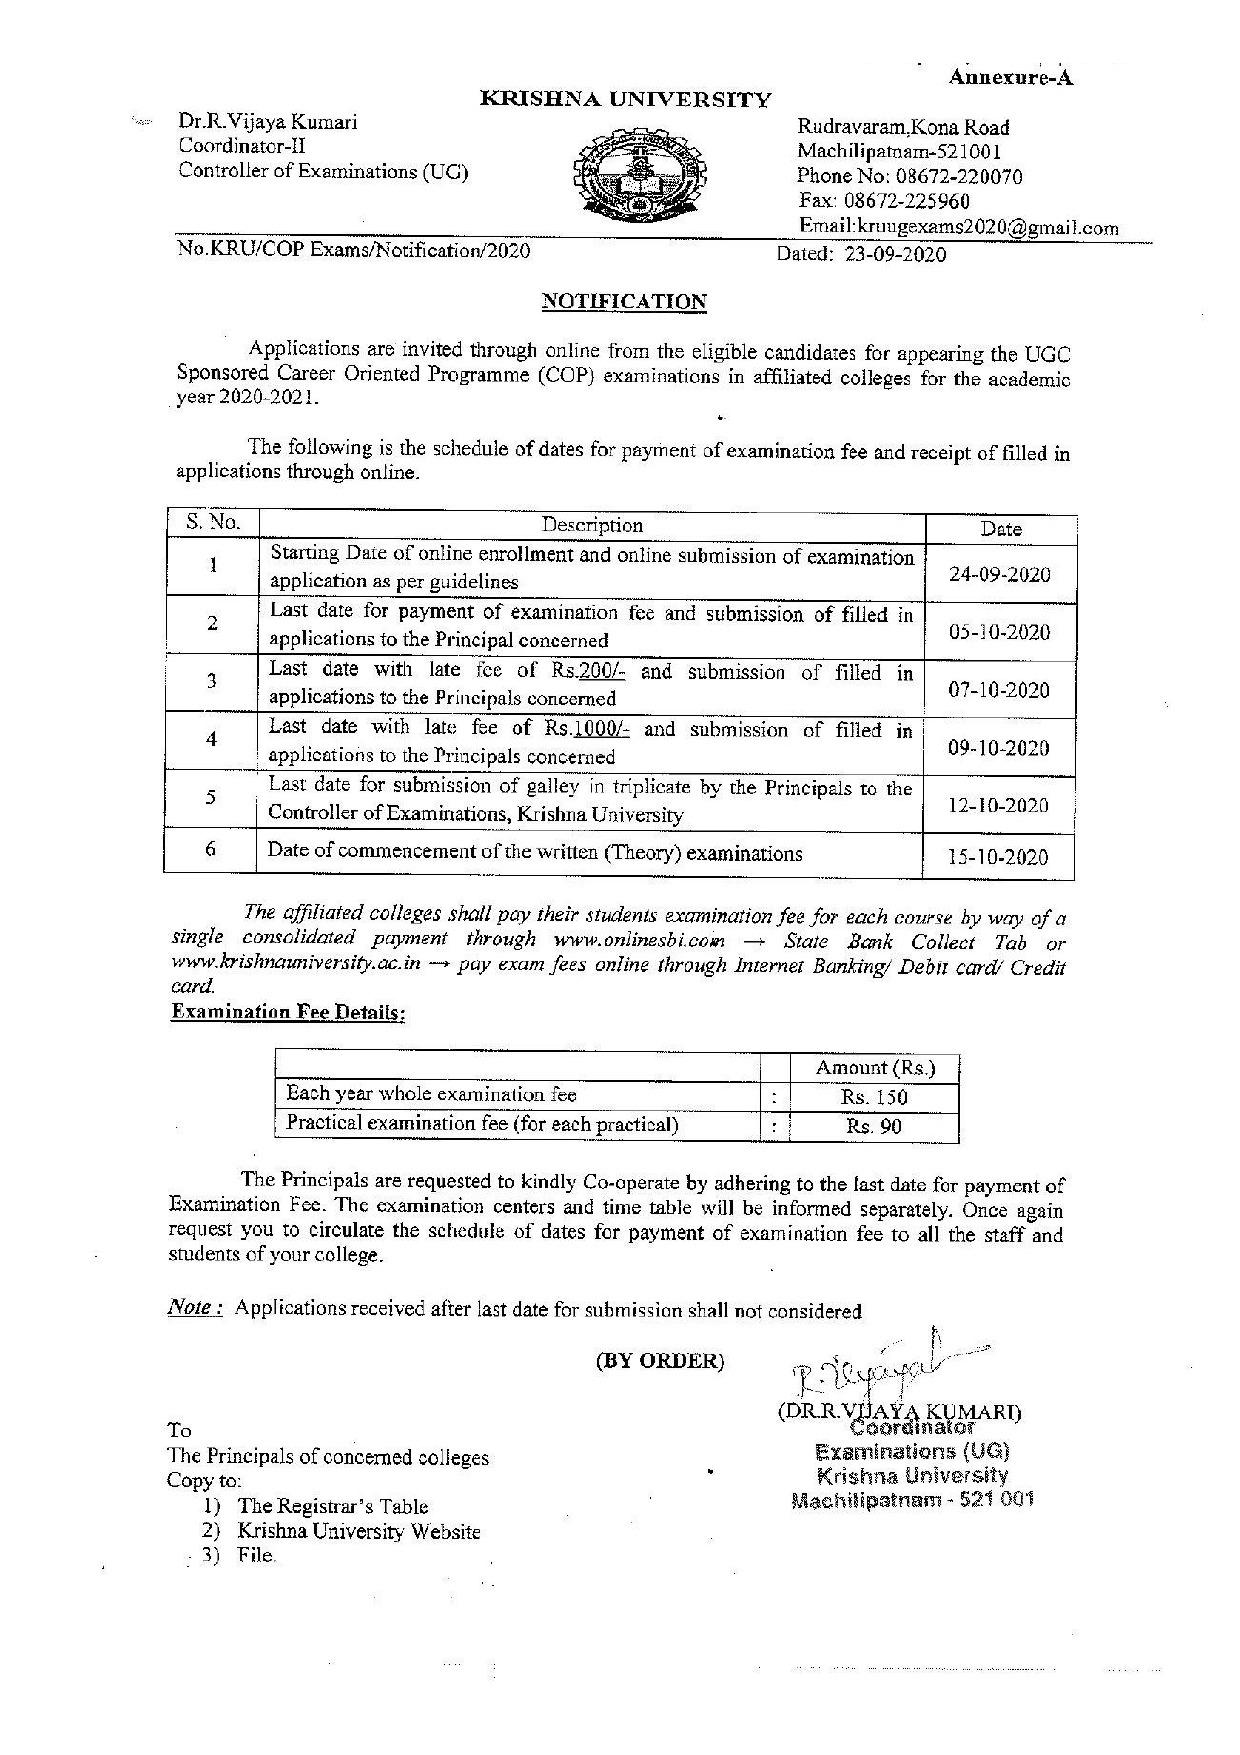 Krishna University COP (Career Oriented Programme) Oct 2020 Exam Fee Notification